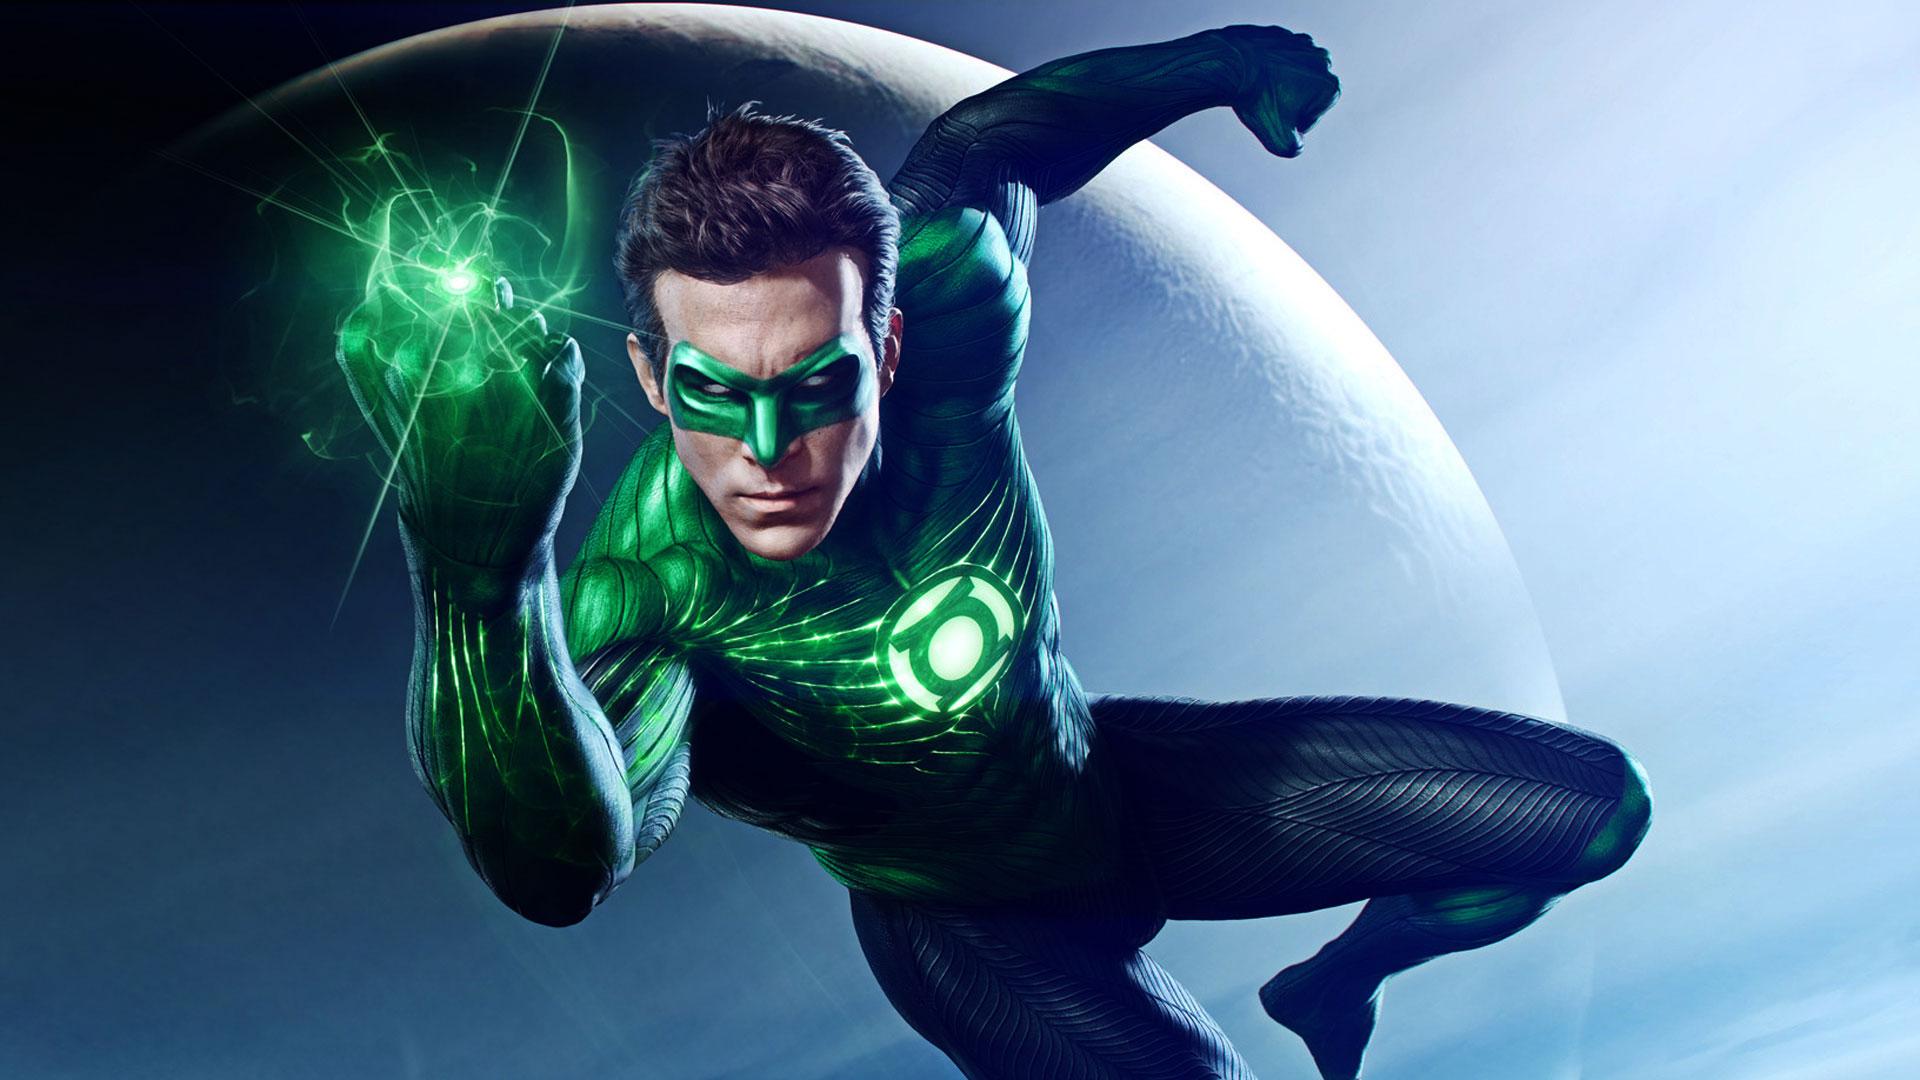 Hal Jordan Green Lantern Movie 5K w3 HD Wallpapers 1920x1080